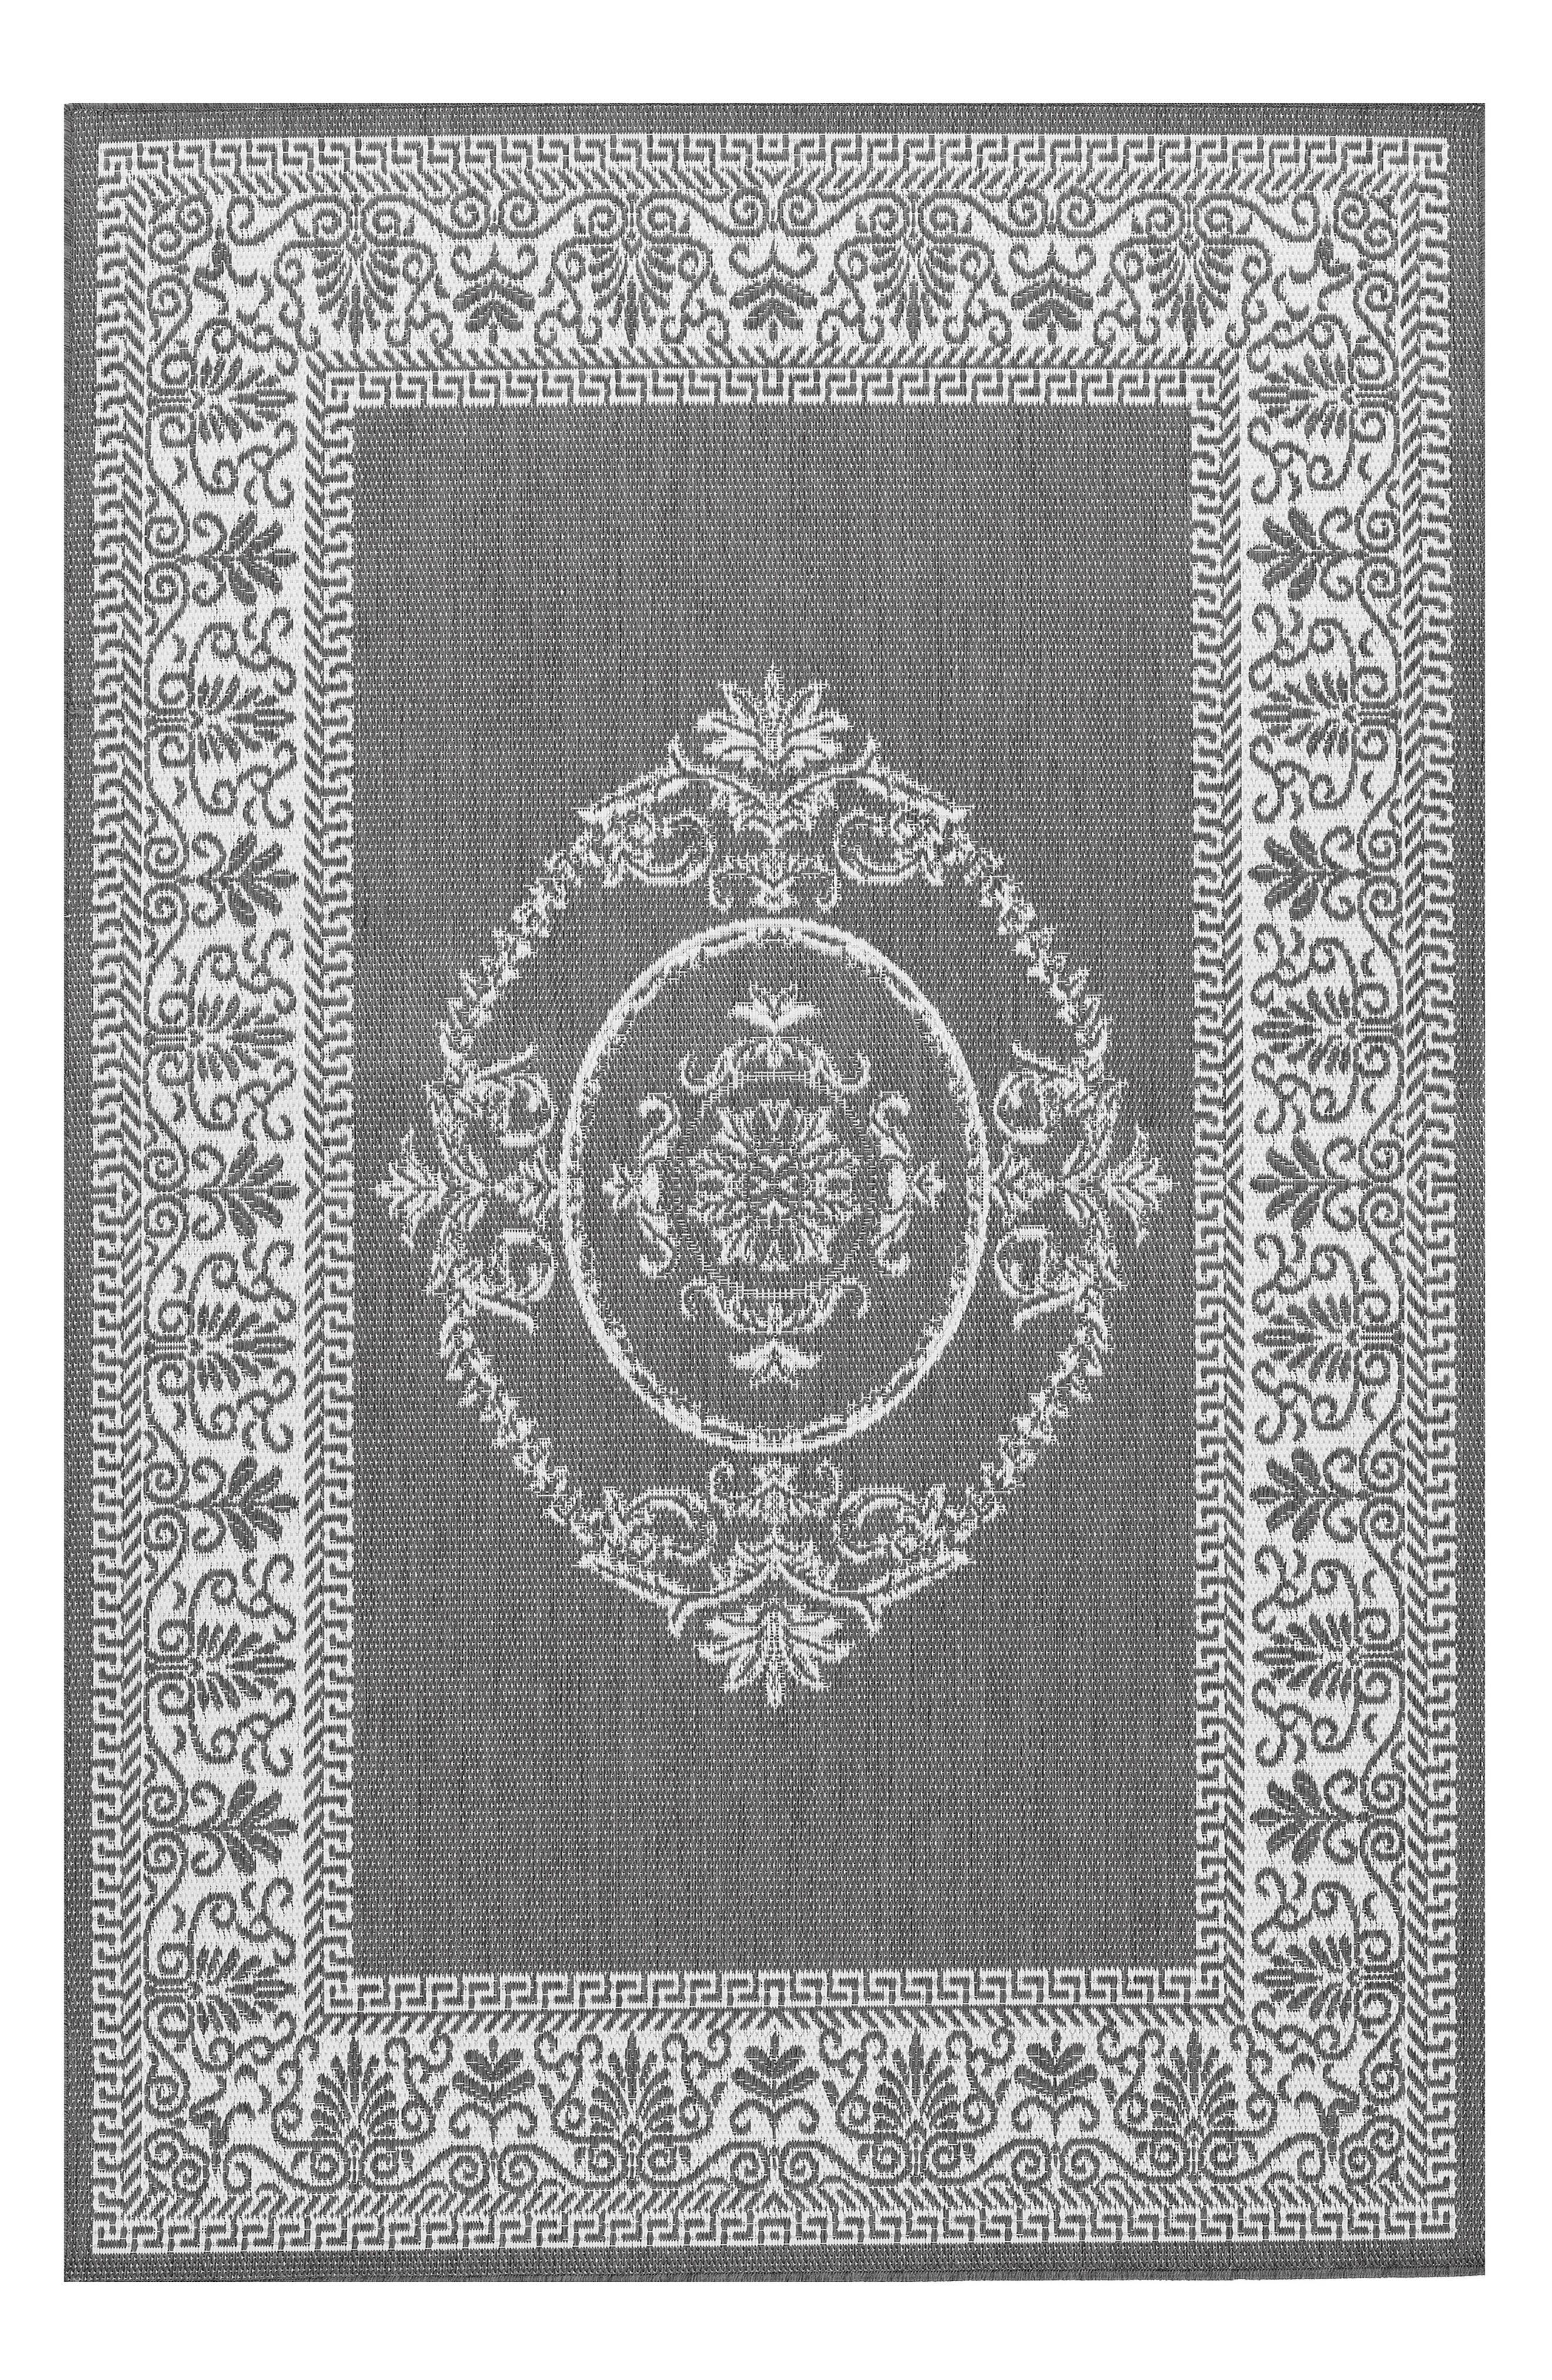 Alternate Image 1 Selected - Couristan Antique Medallion Indoor/Outdoor Rug